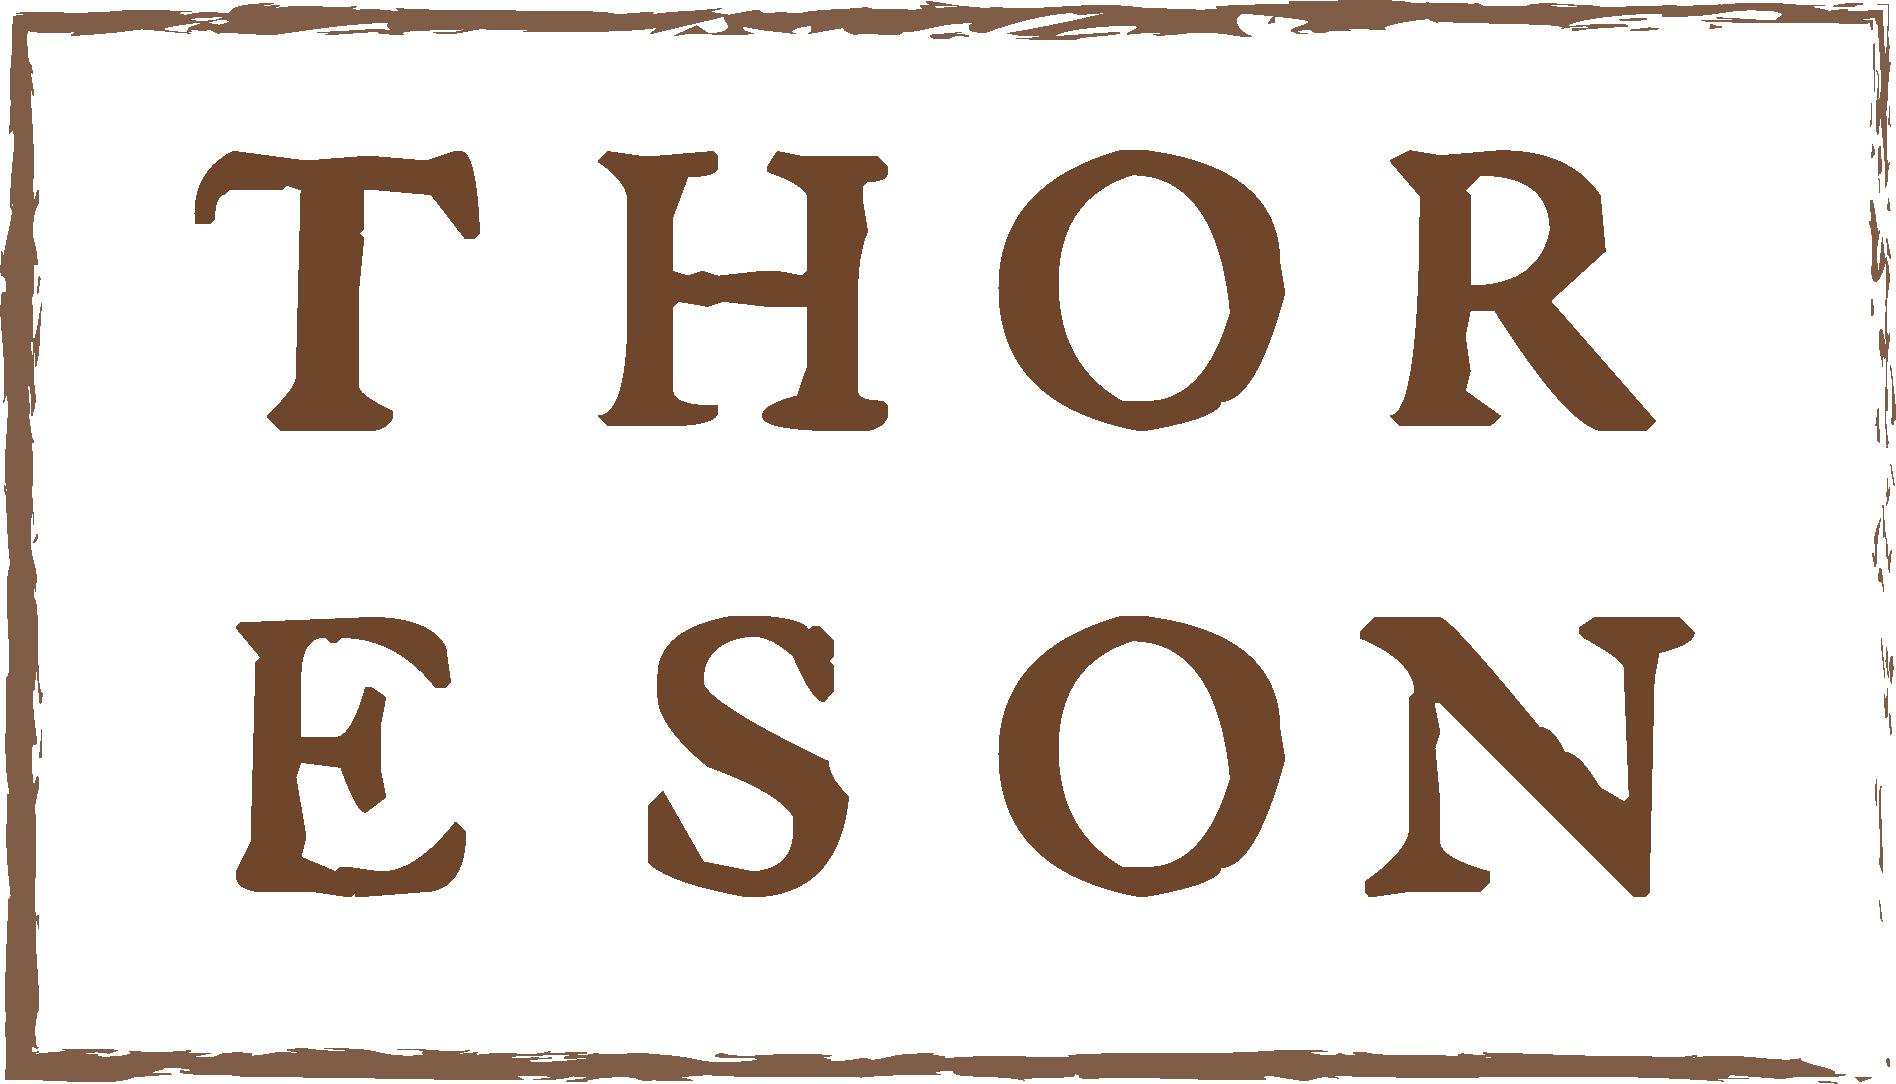 Thoresonlogo.png